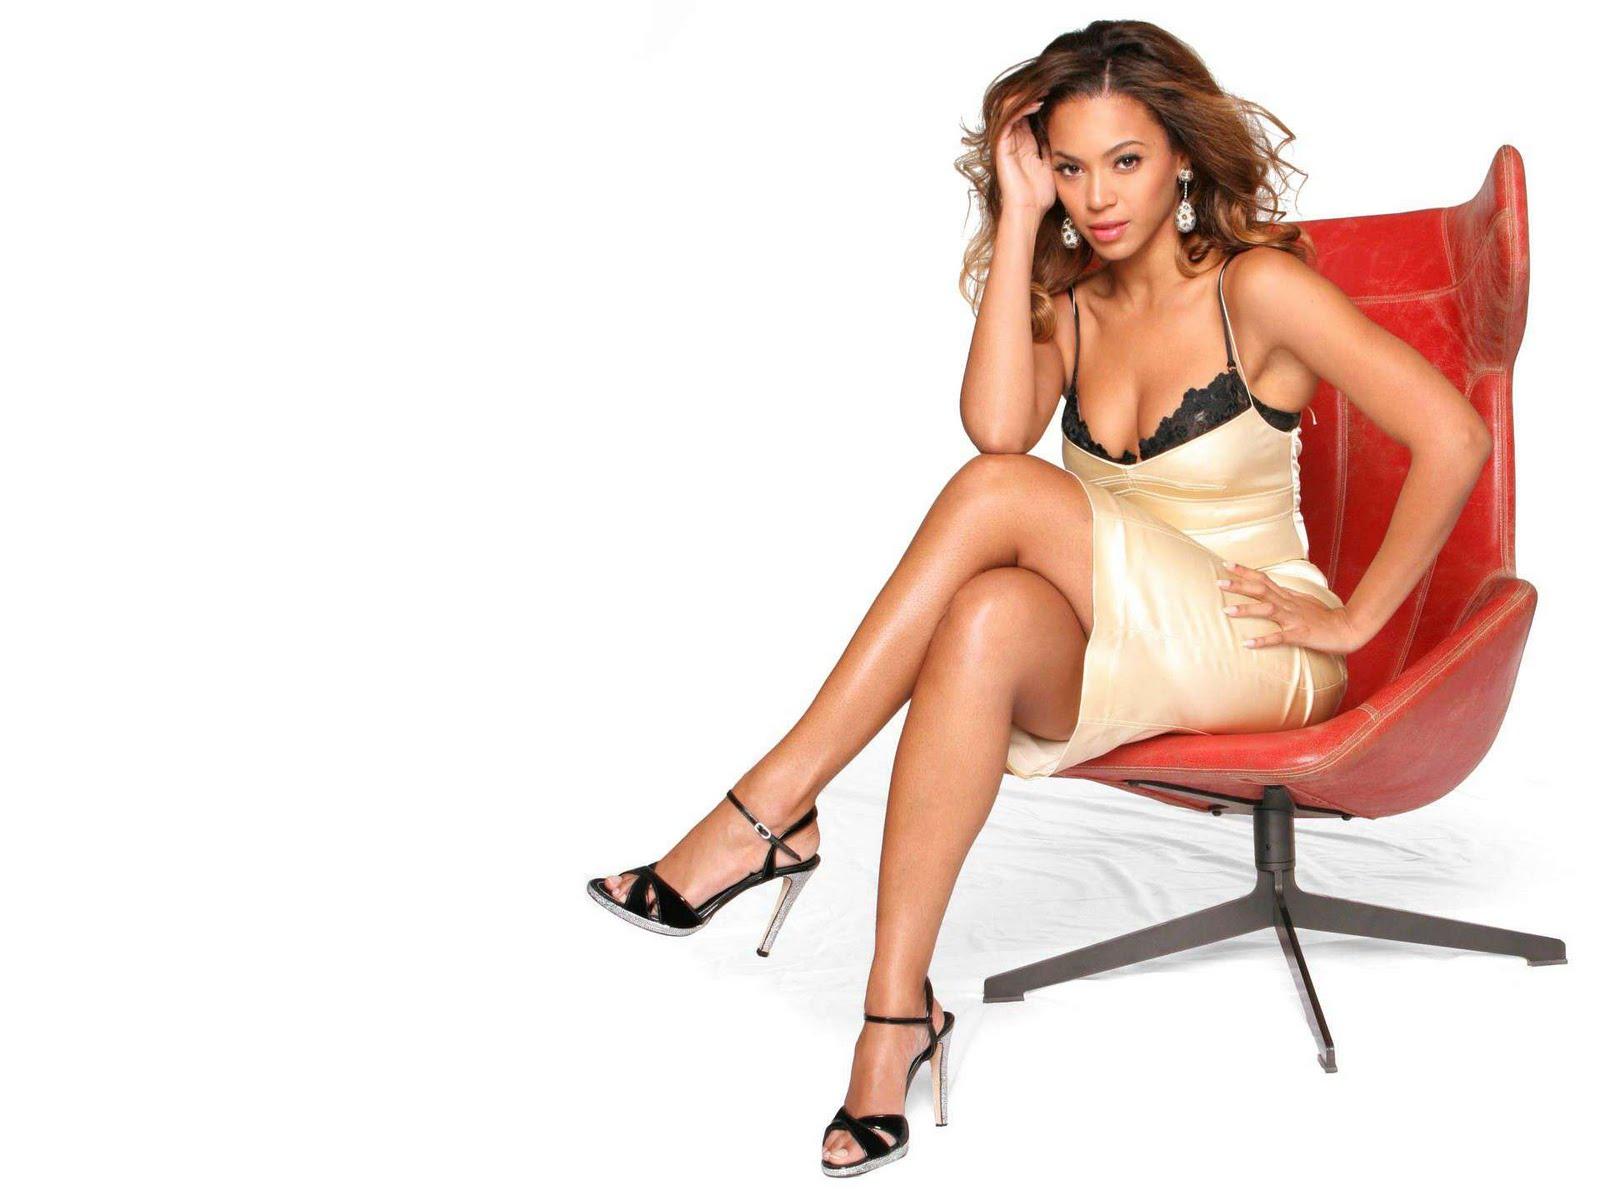 http://1.bp.blogspot.com/-3nfpx7kMmg8/TiRe6Ae7K0I/AAAAAAAAIL4/2UbJWkwyUEs/s1600/Beyonce+-Knowles+-14.jpg